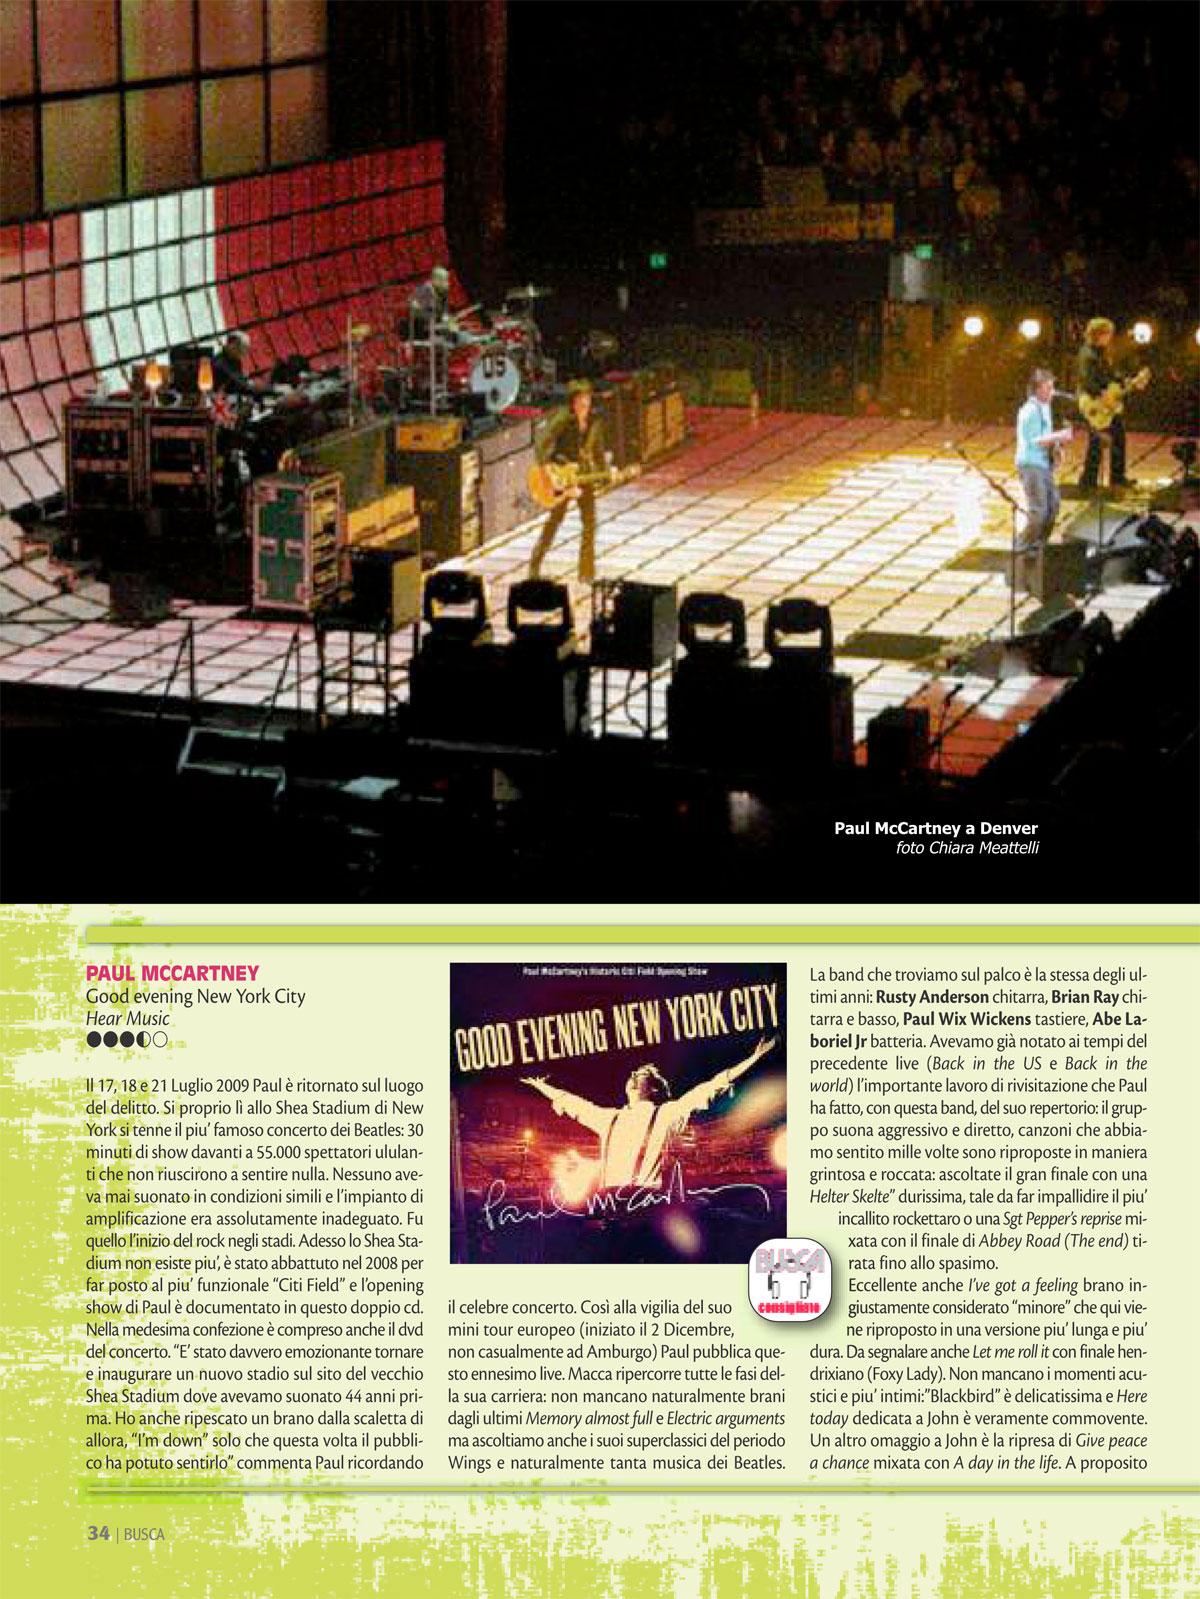 Buscadero: Paul McCartney interview